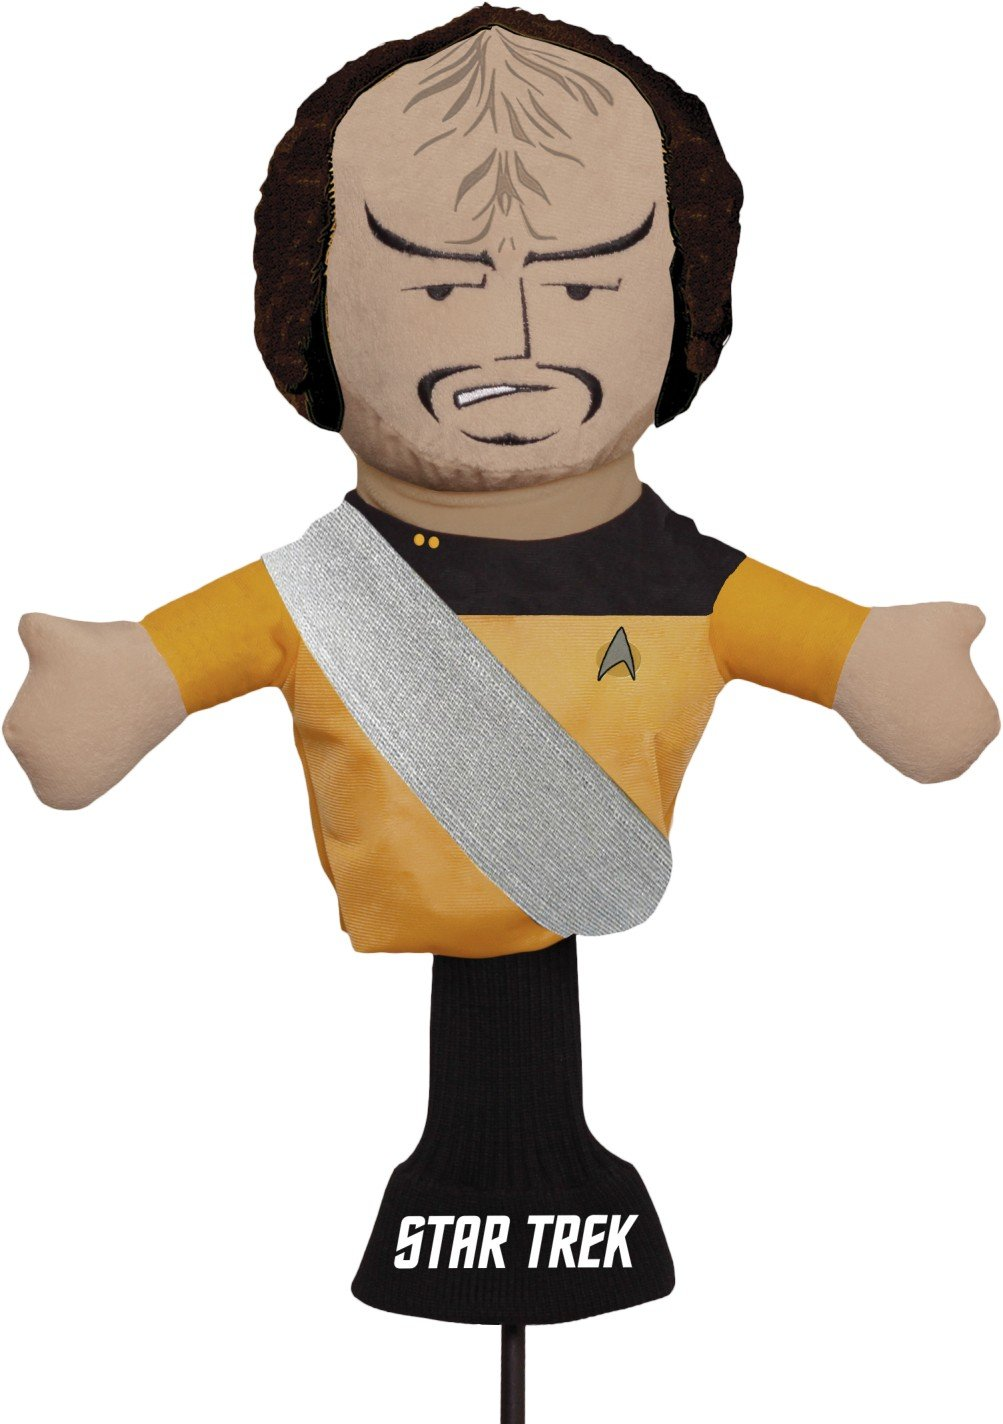 Creative Covers for Golf Star Trek Klingon Club Head Covers